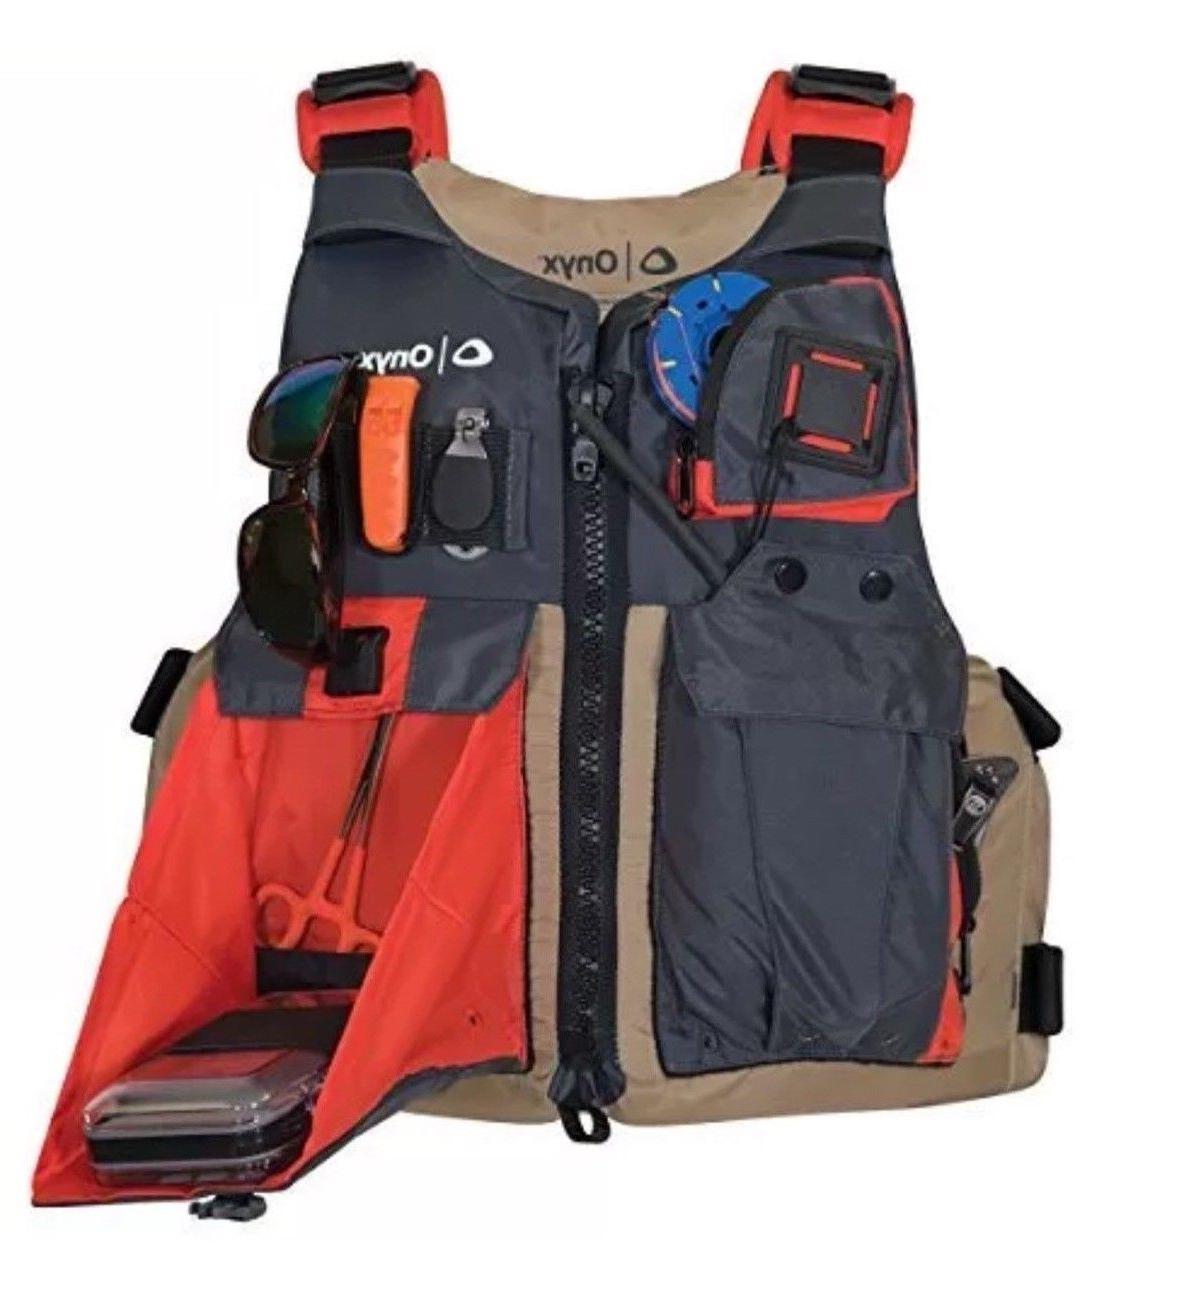 ONYX Kayak Fishing Life Jacket, One Size, Tan.